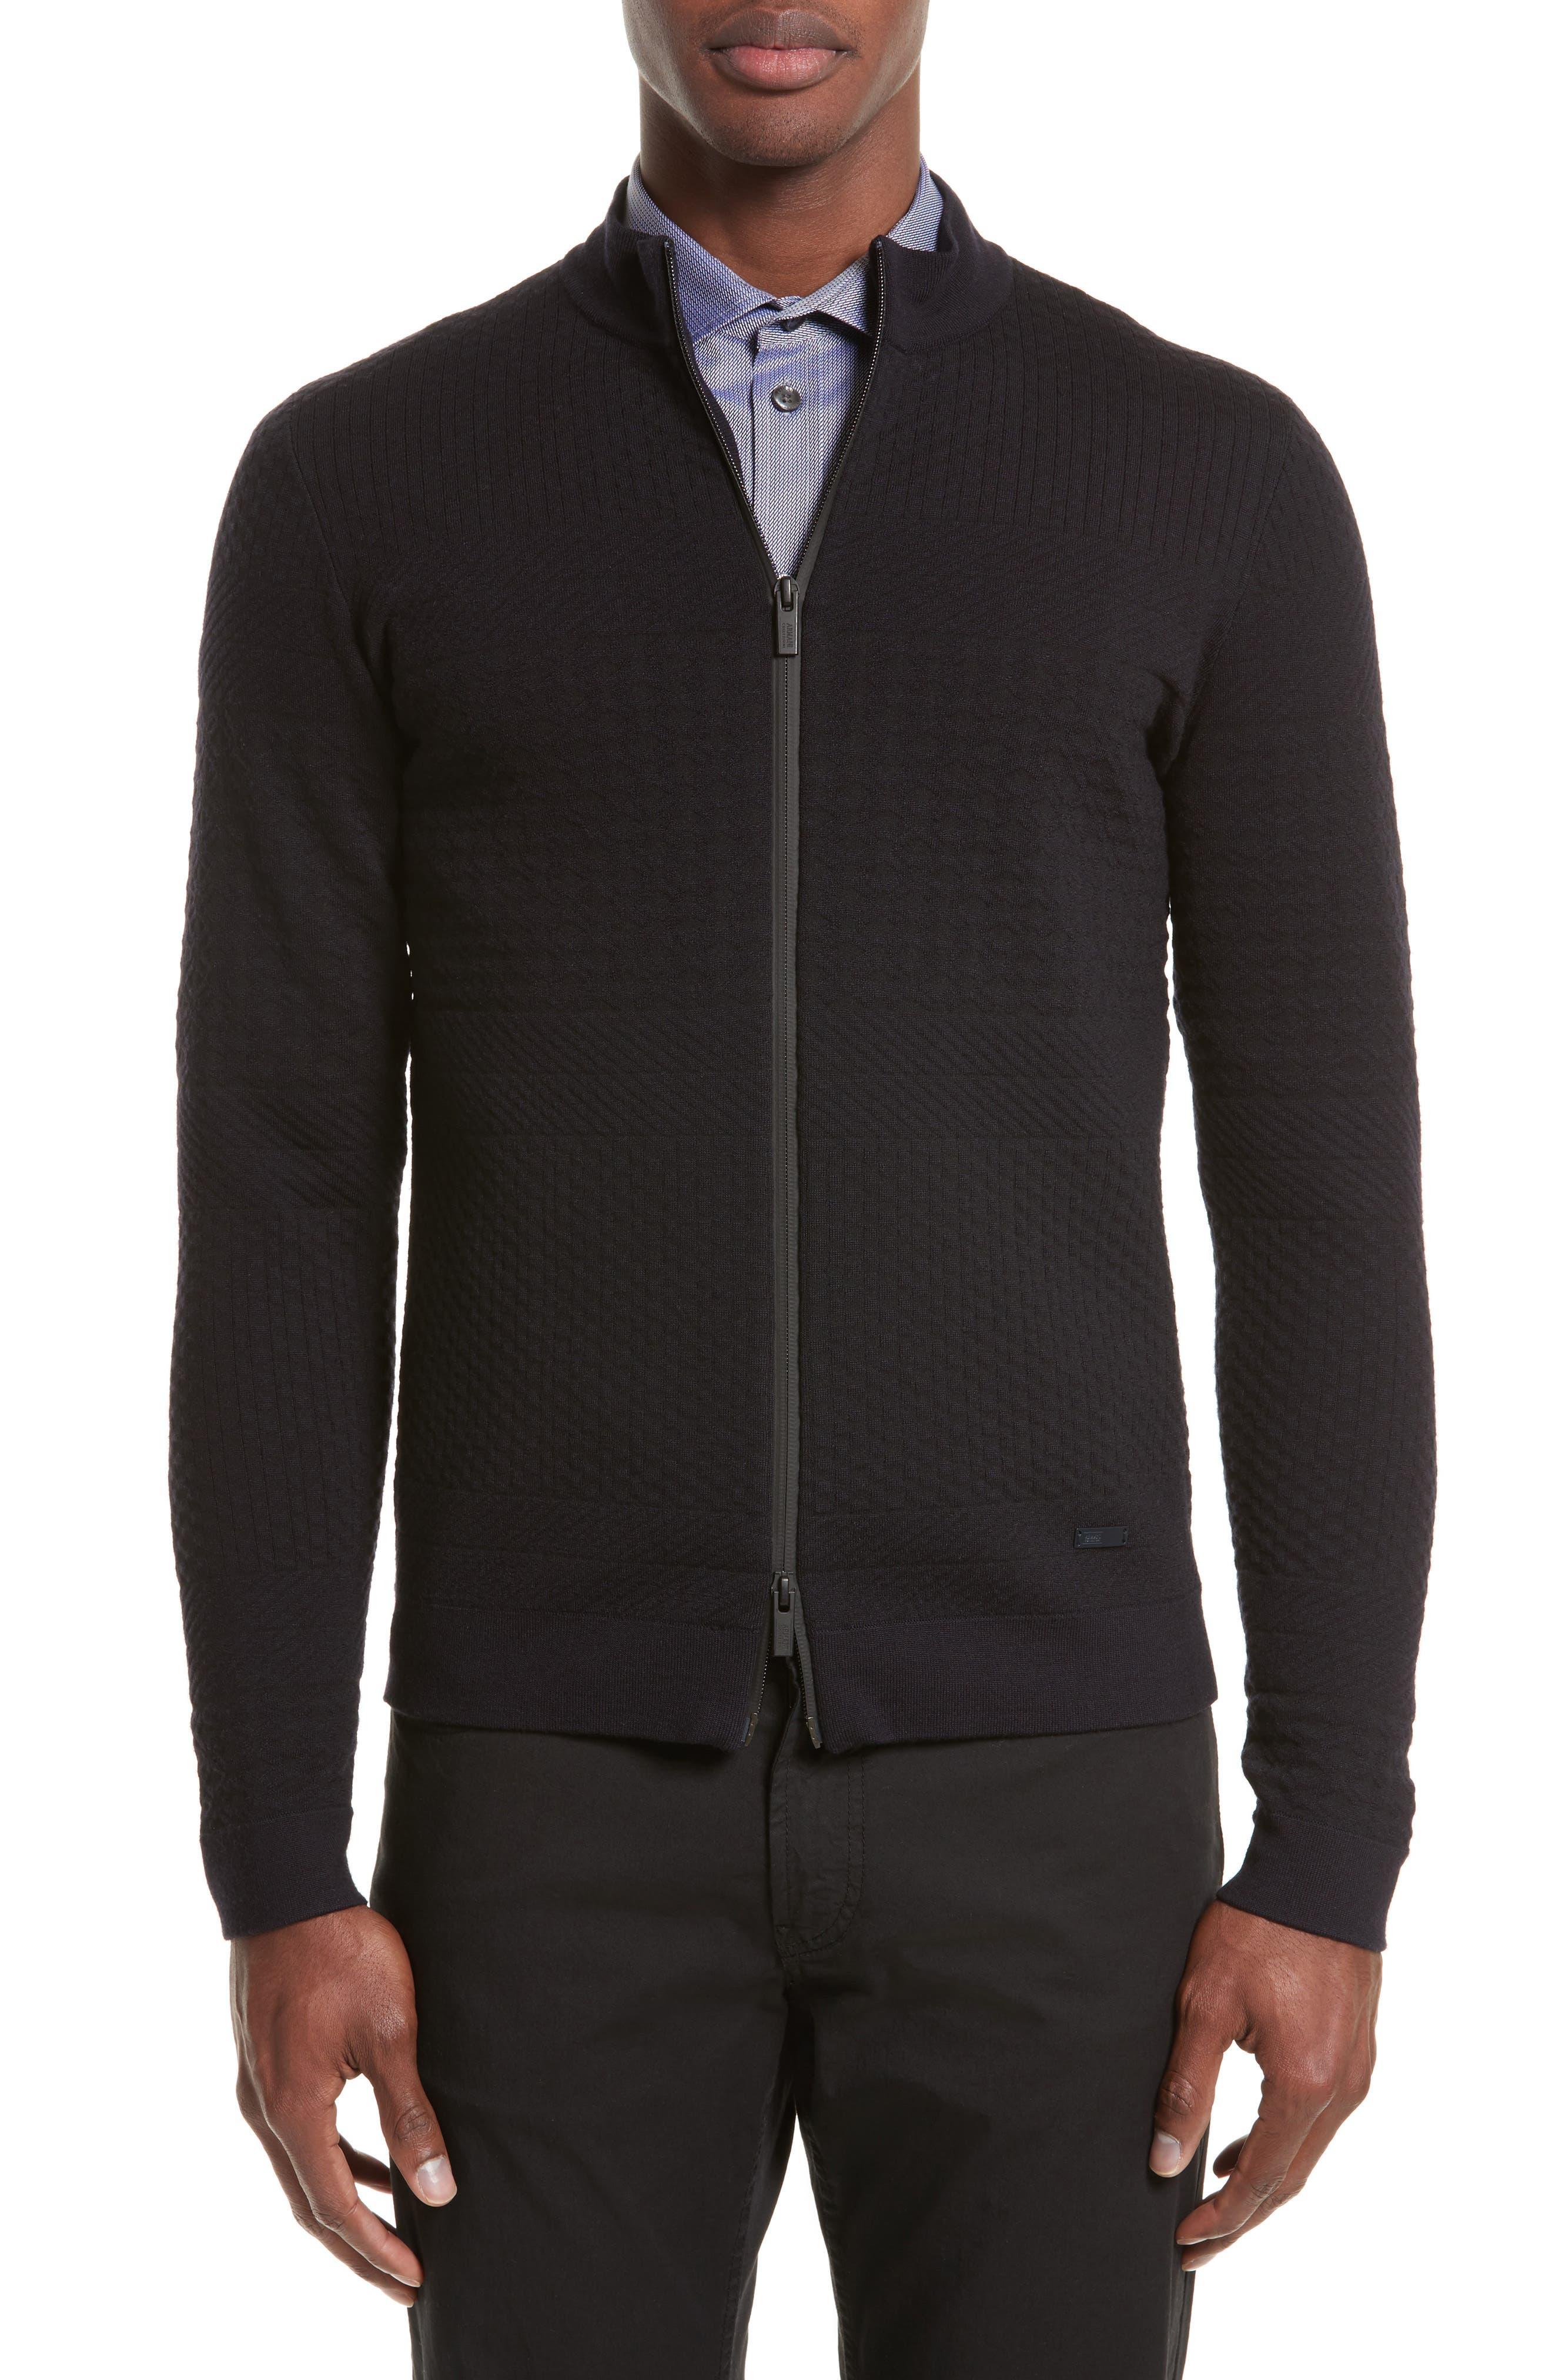 Main Image - Armani Collezioni Full Zip Jacquard Sweater